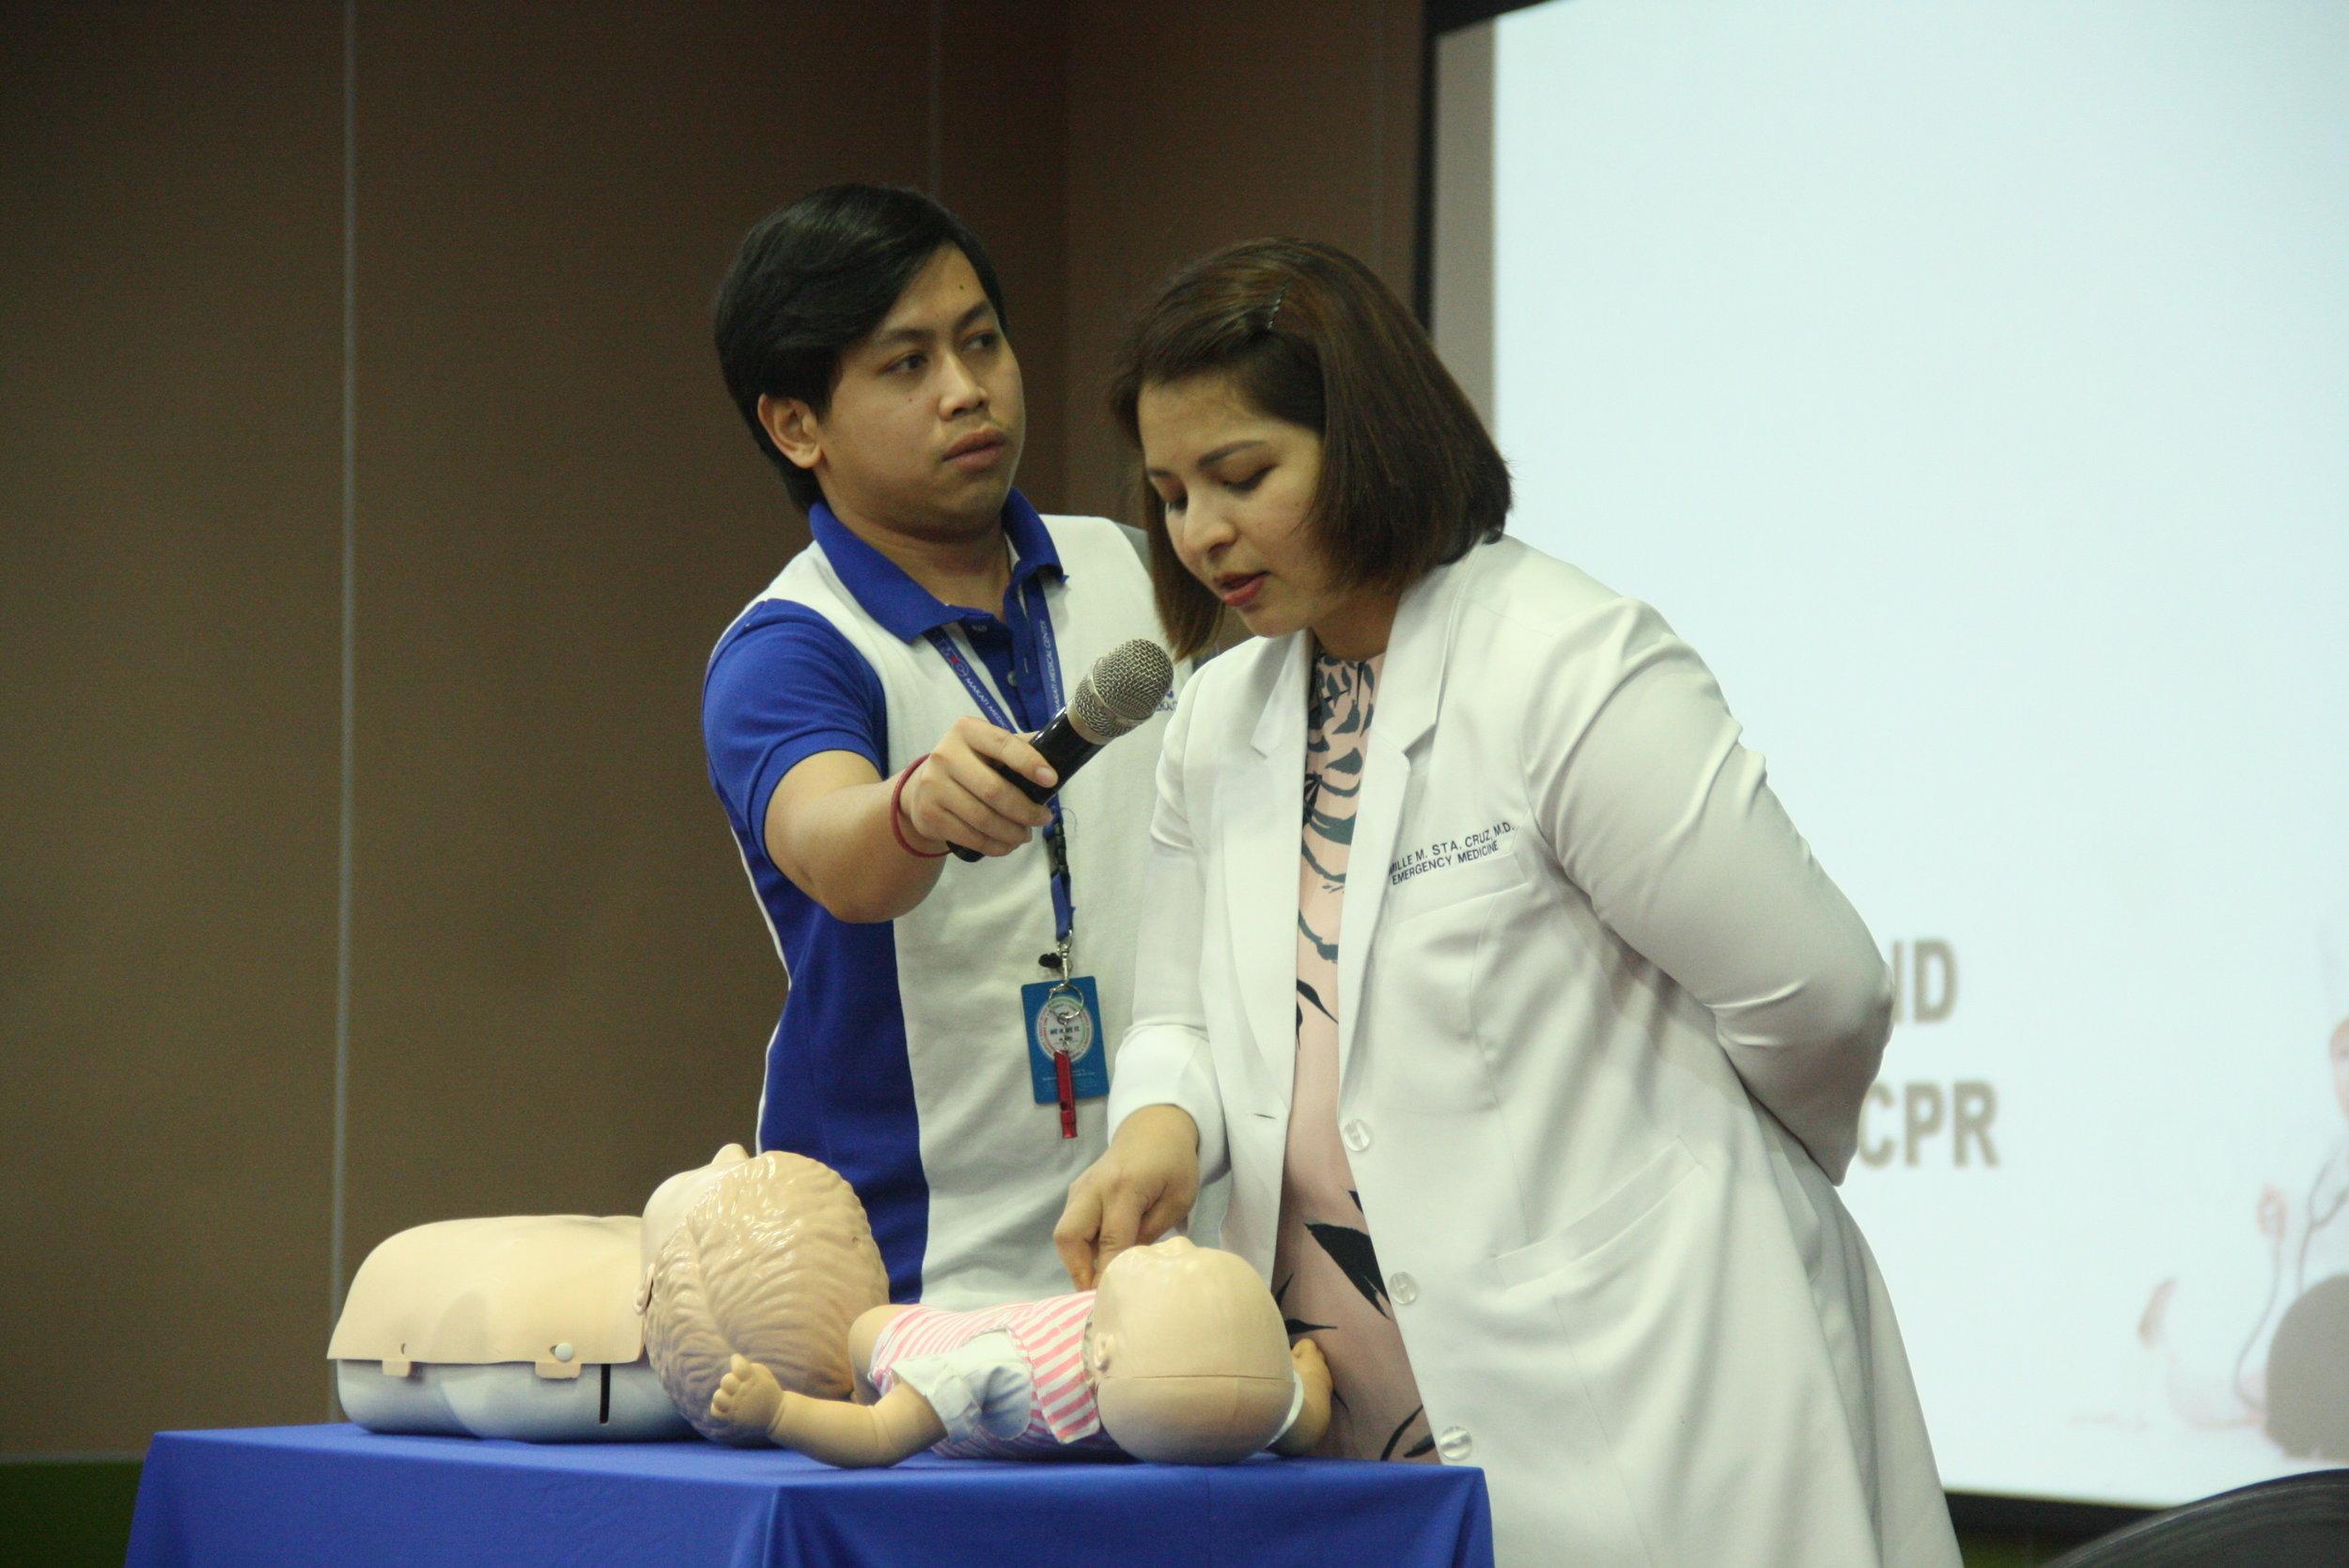 Dr. Camille Sta. Cruz, Emergency Medicine Doctor, demonstrating proper first aid for babies